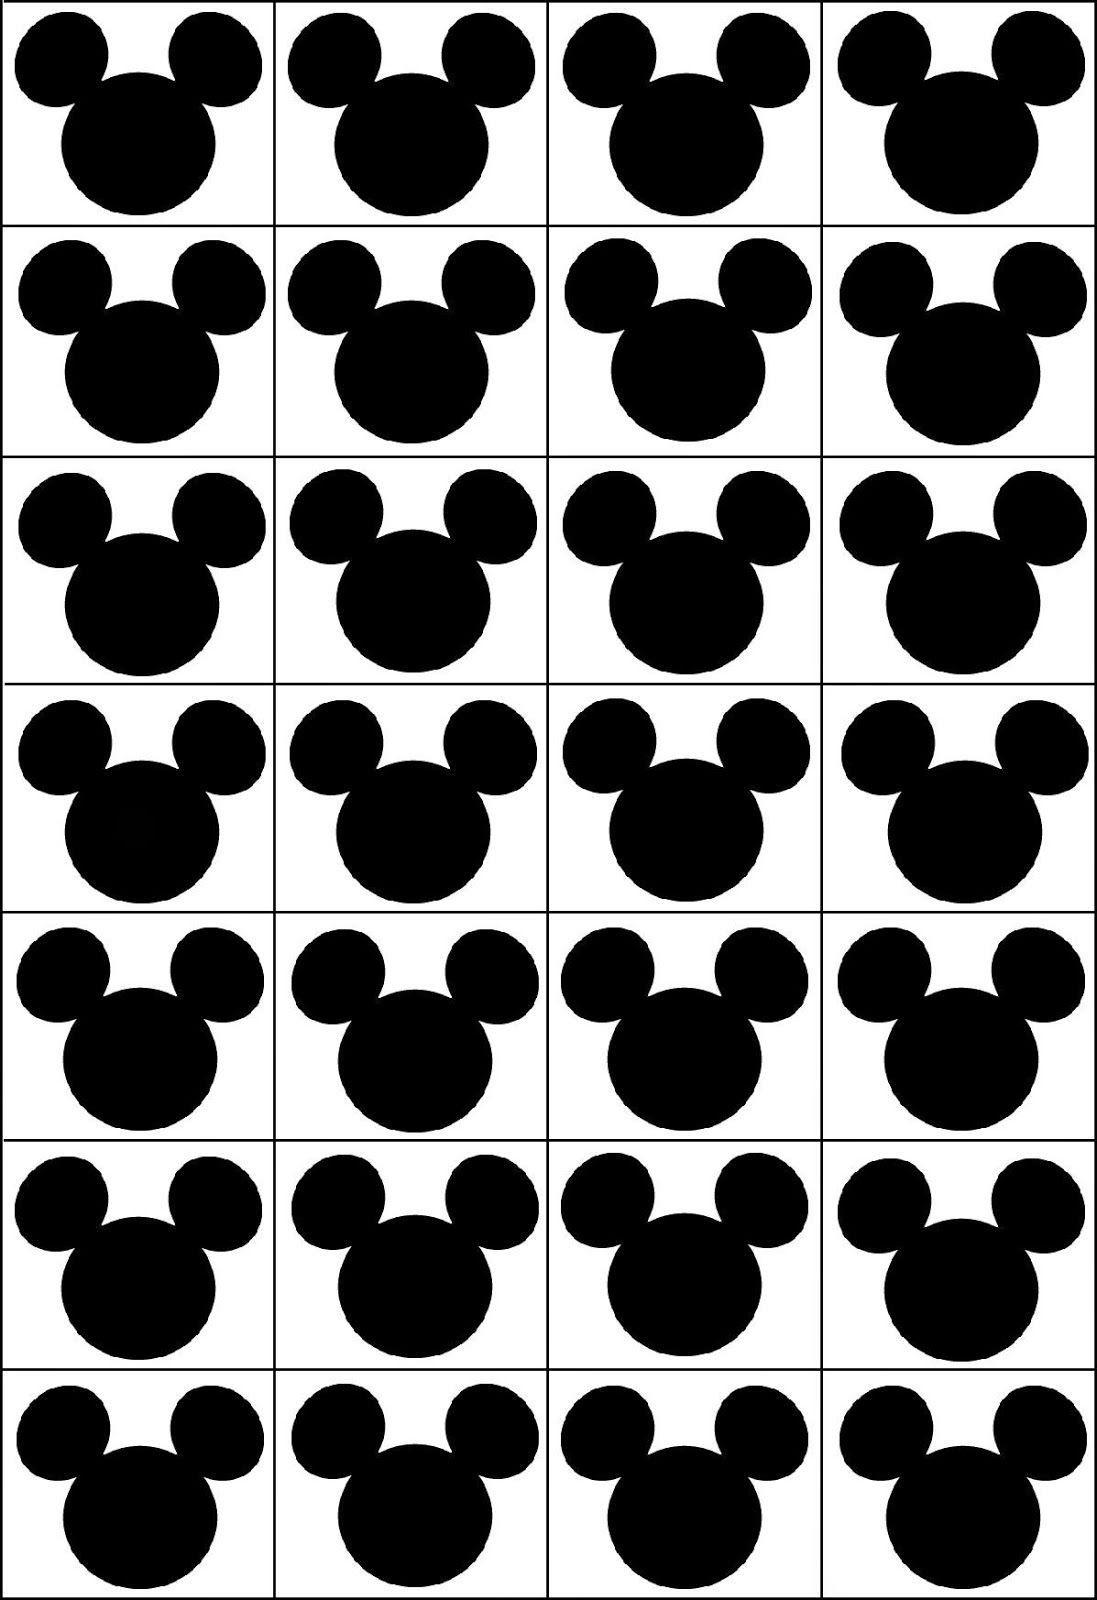 Bingo de Personajes Disney, para Imprimir Gratis. | Escolar ...